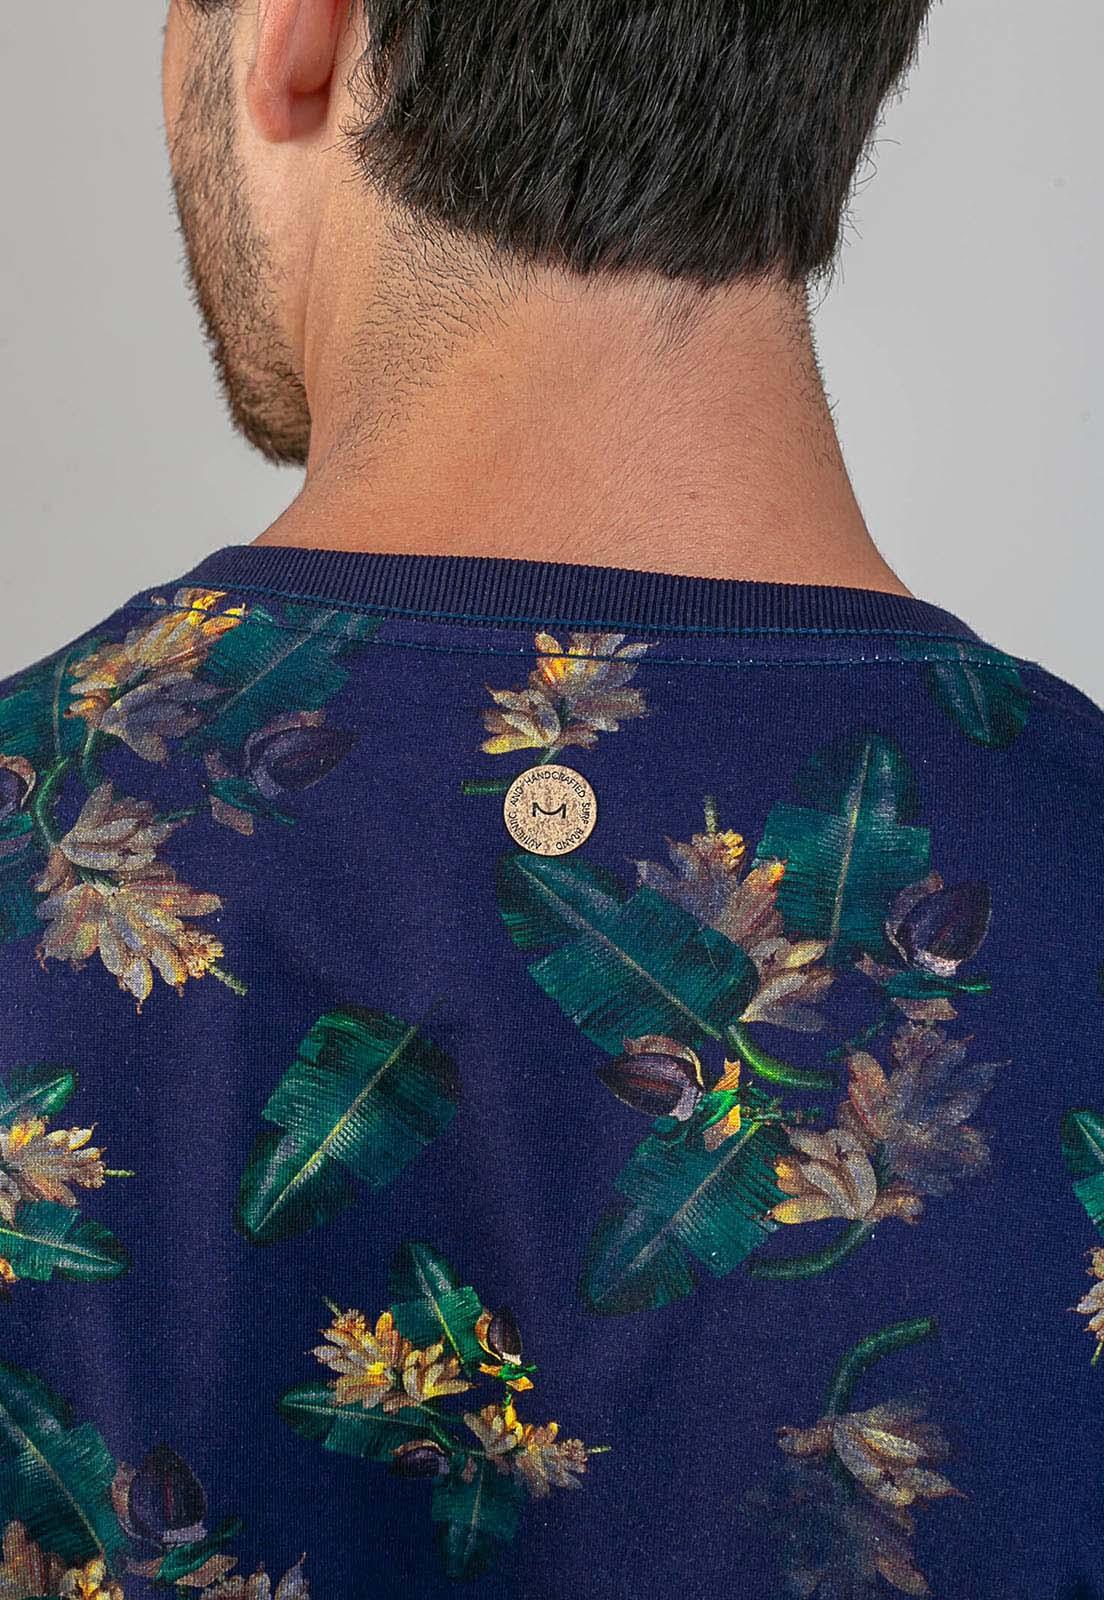 T-Shirt Newport Beach melty  - melty surf & Co.